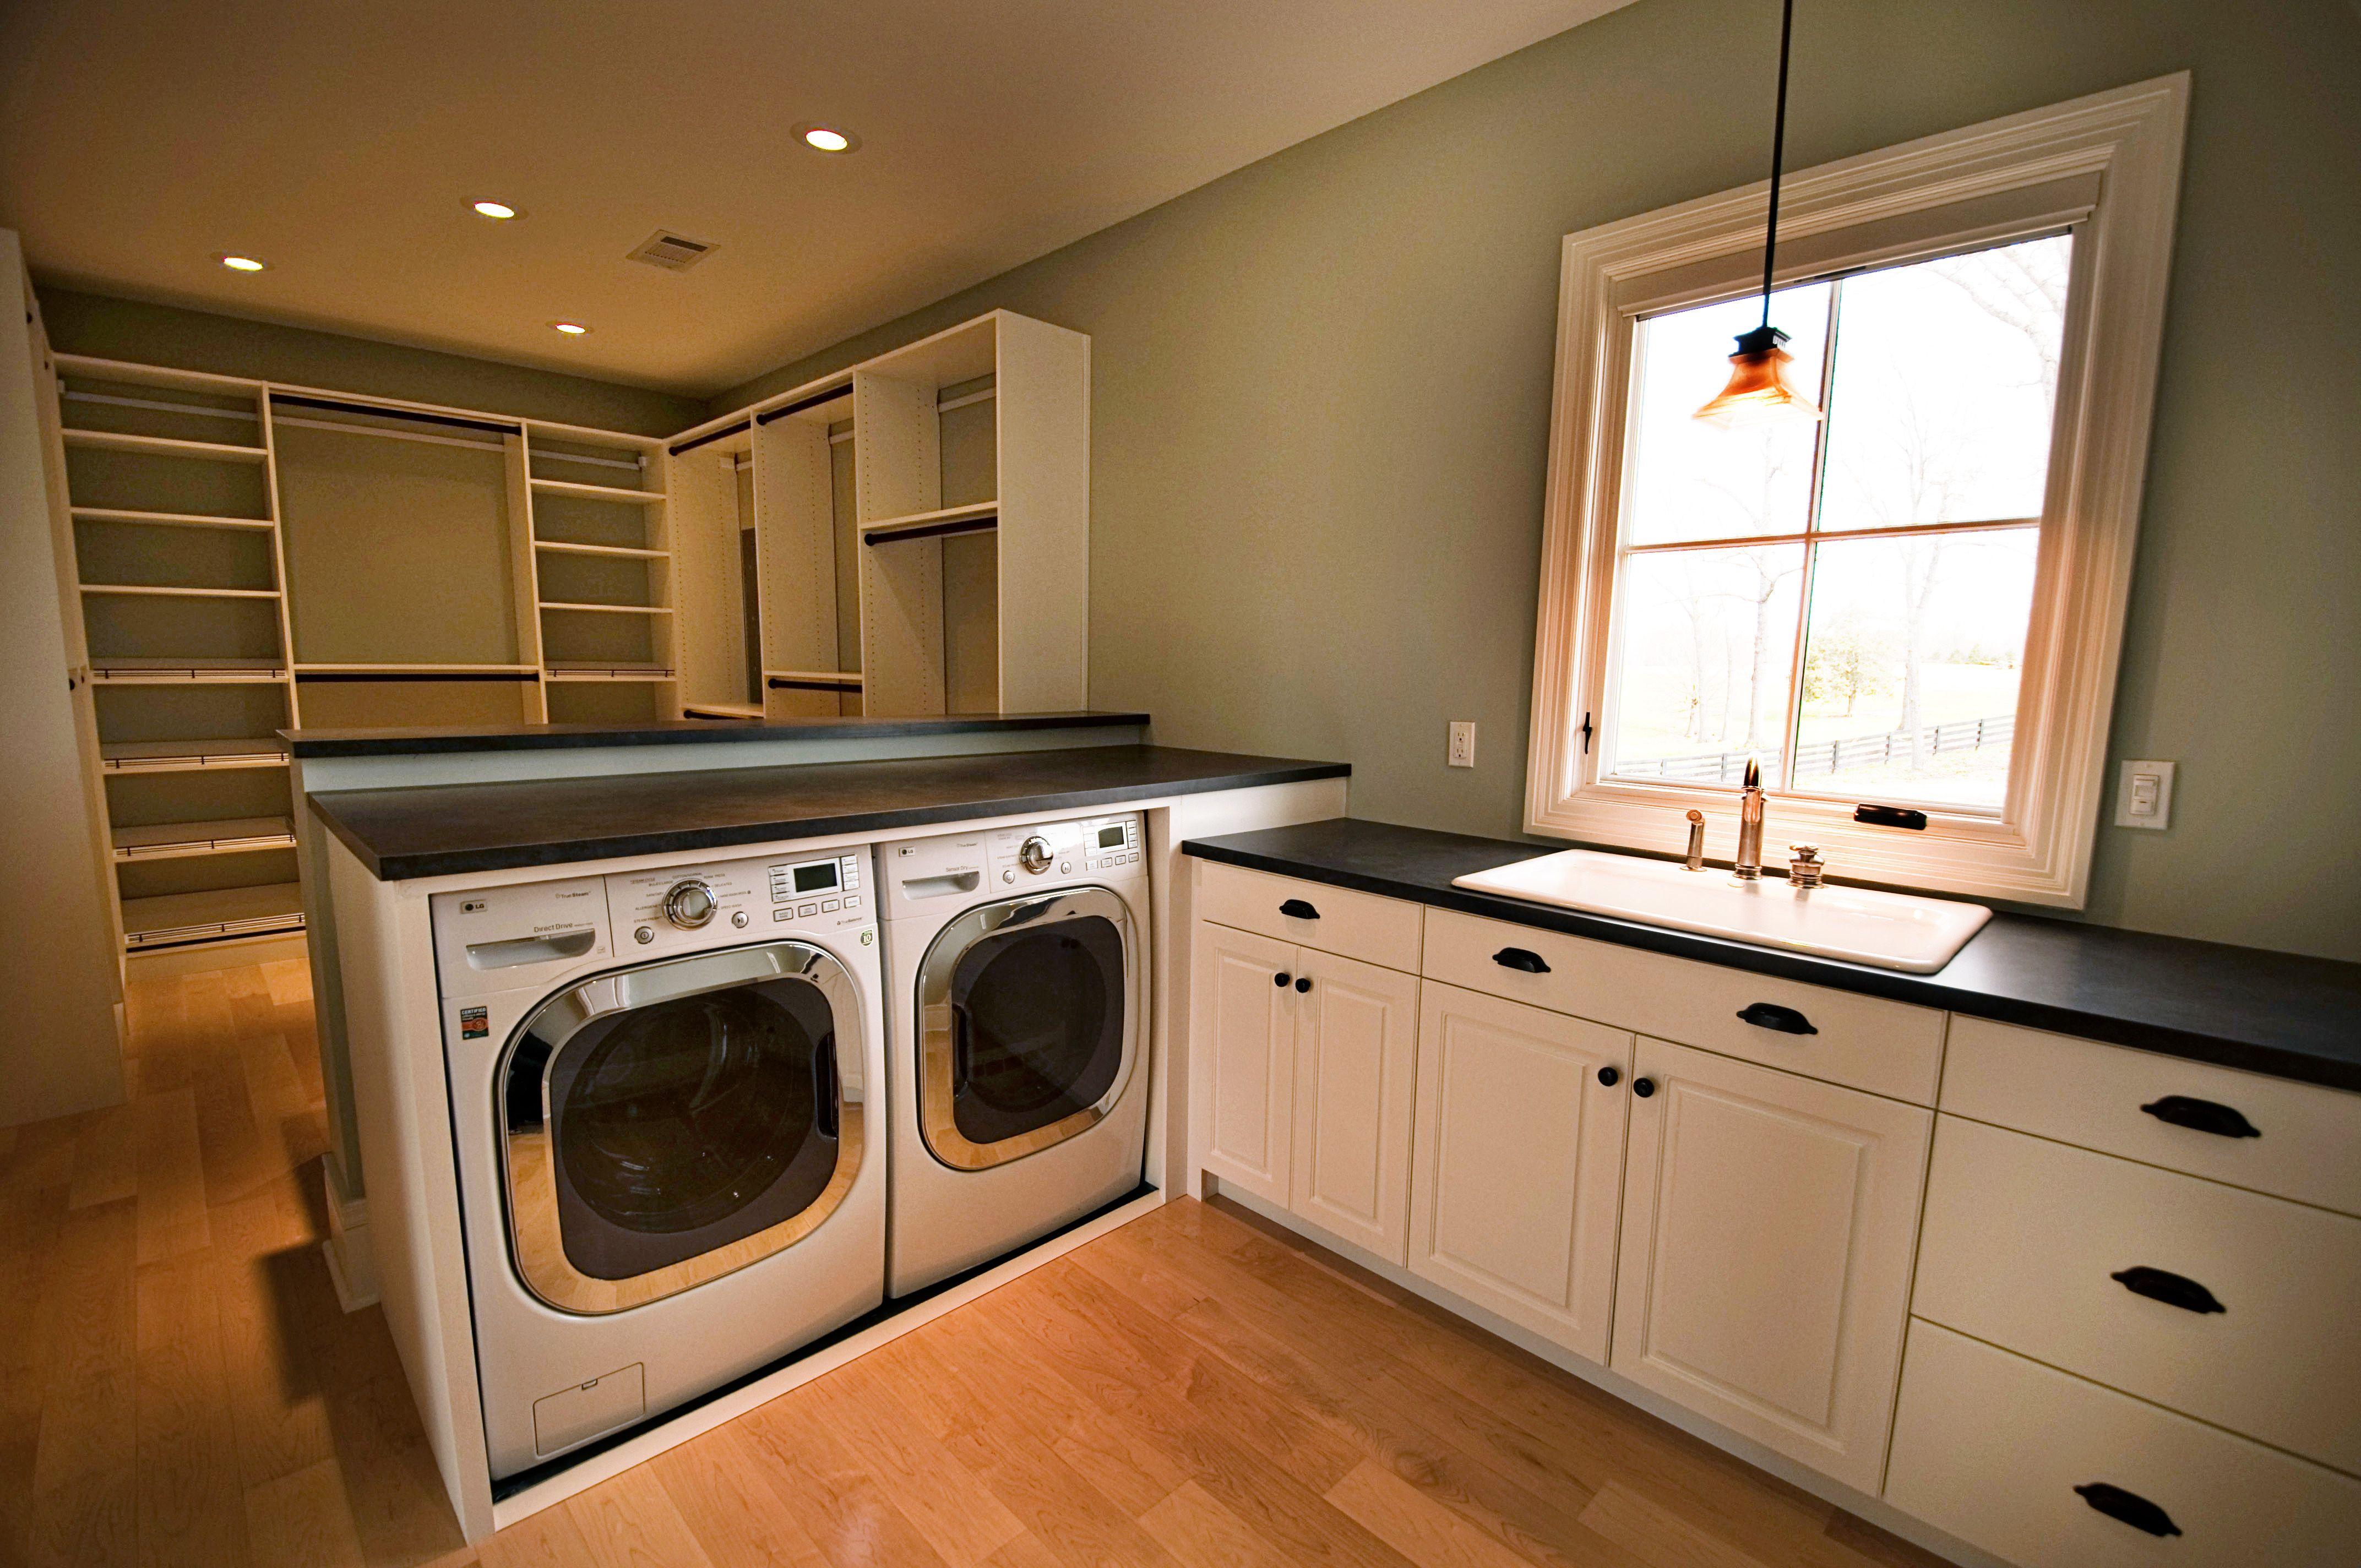 Master Closet With Laundry Room Laundry Room Laundry Room Closet Master Closet